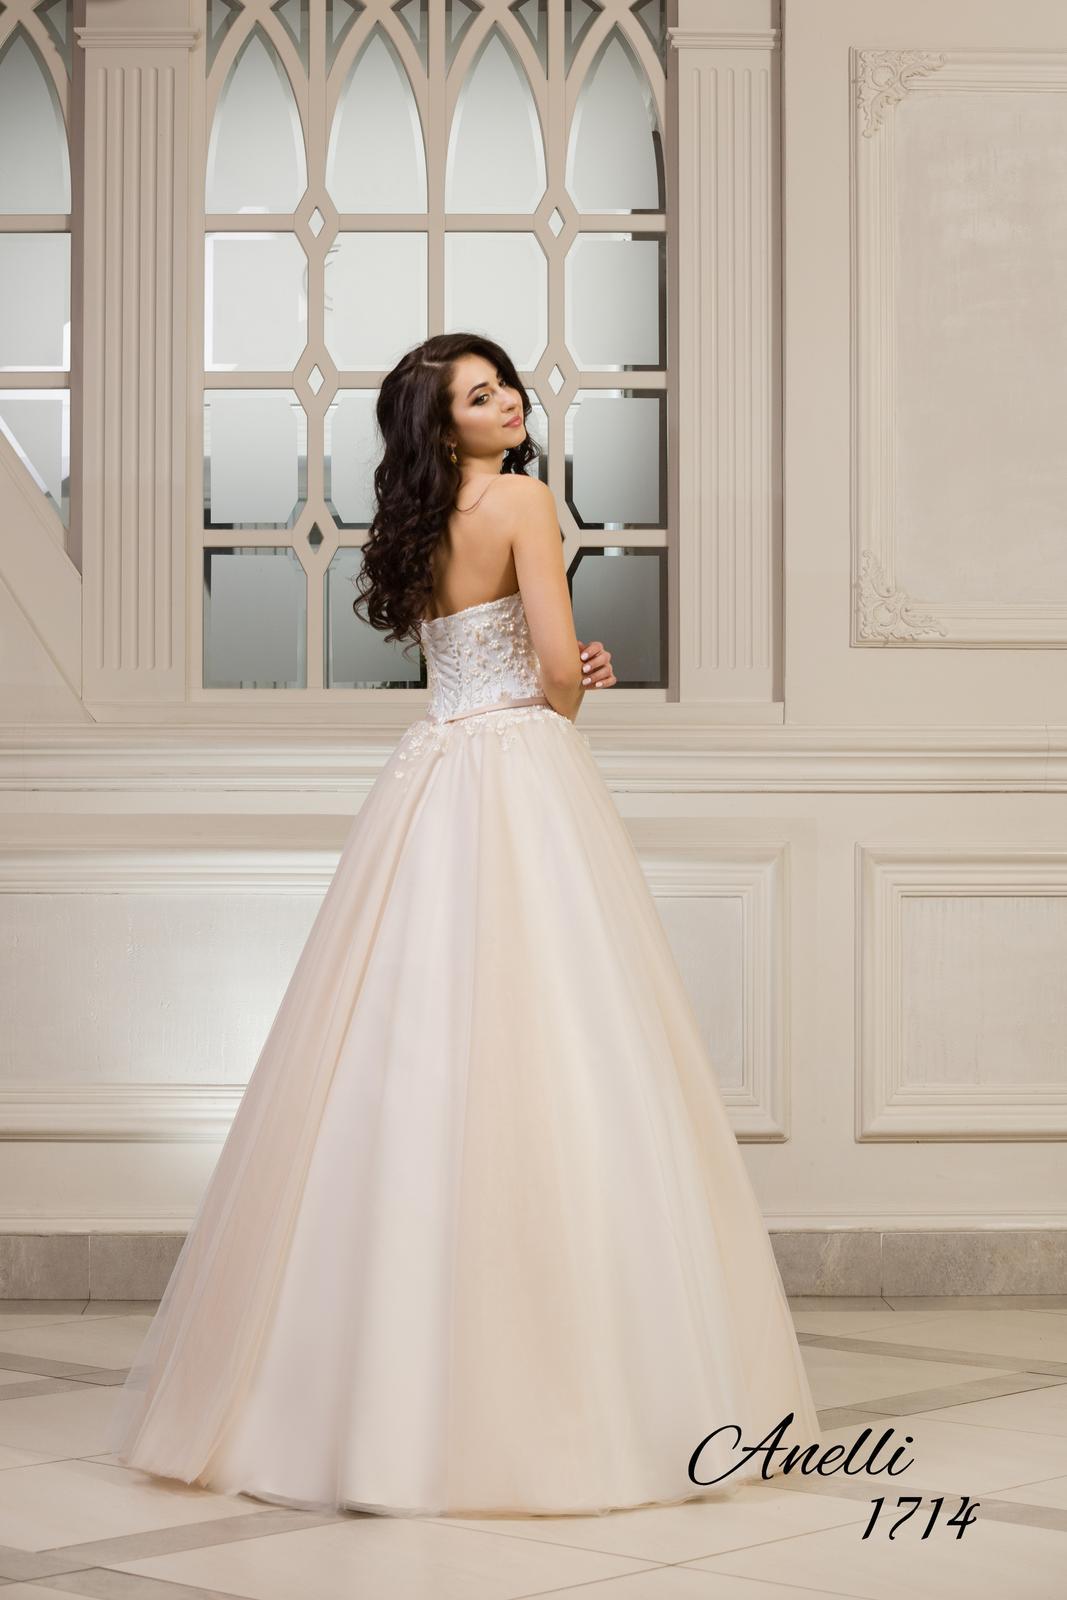 Svadobné šaty - Debut 1714 - Obrázok č. 2